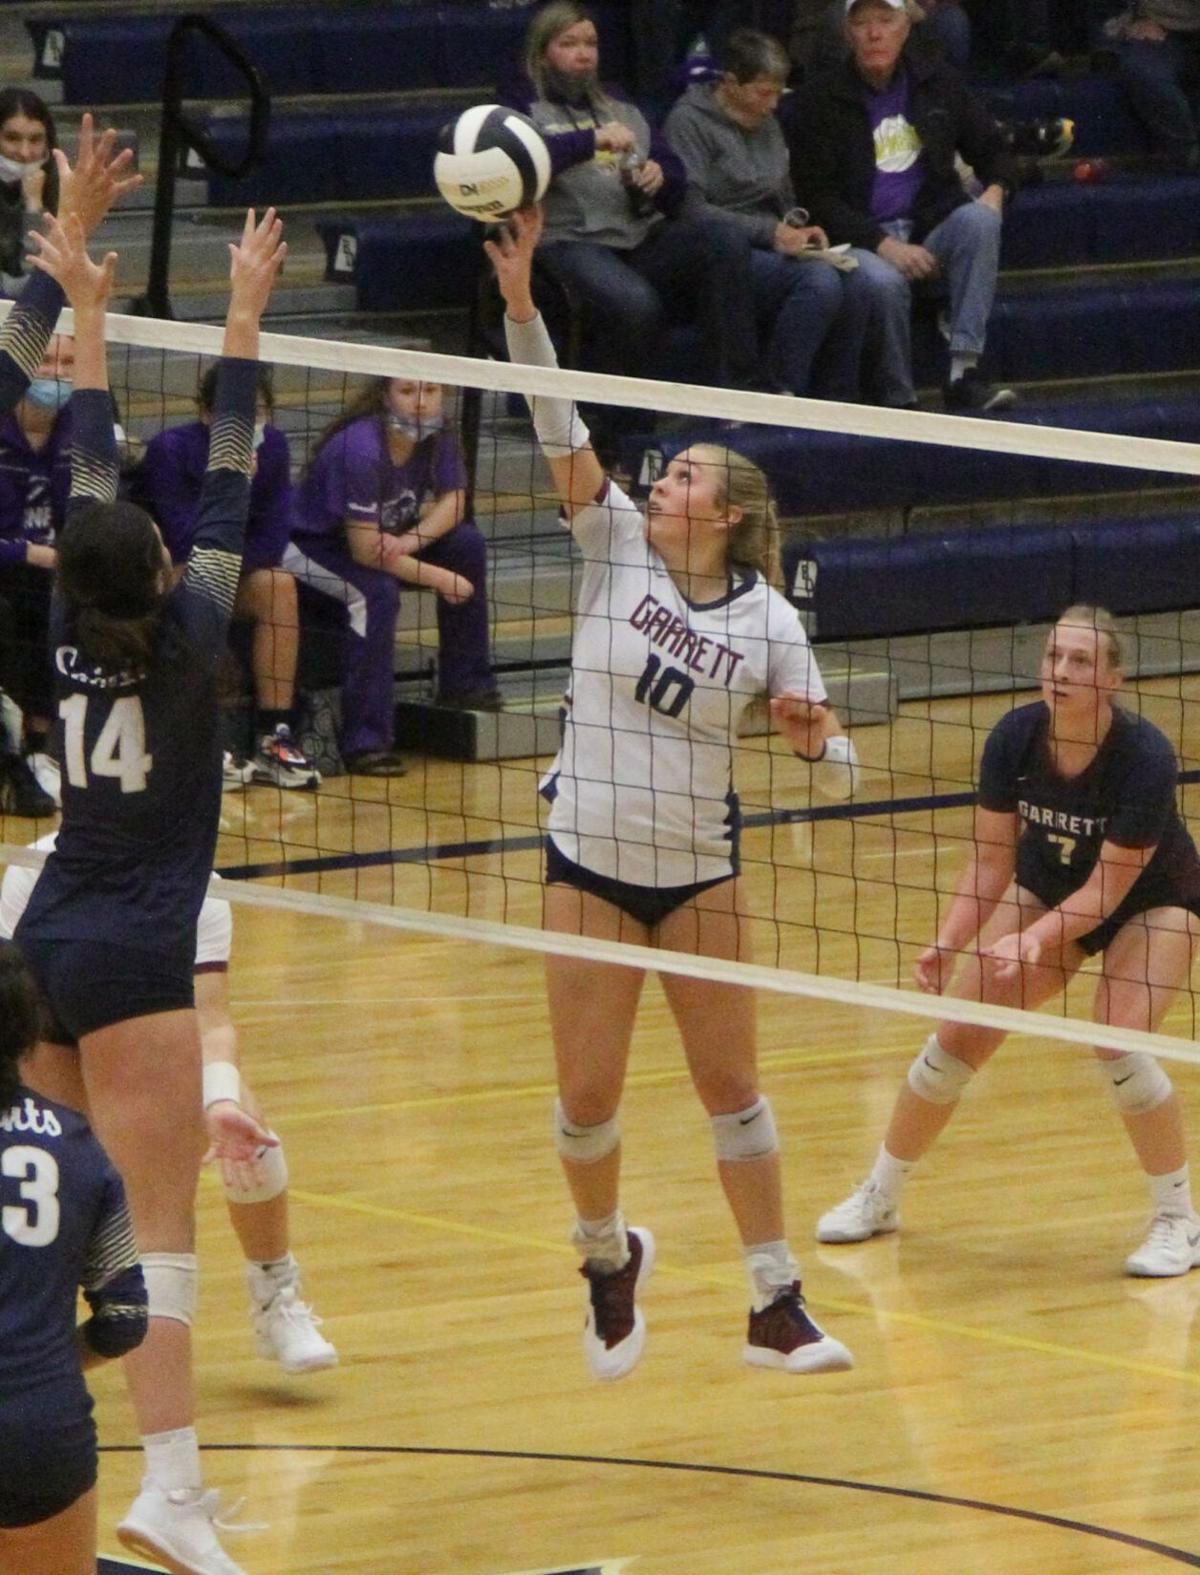 Garrett's volleyball season comes to an end